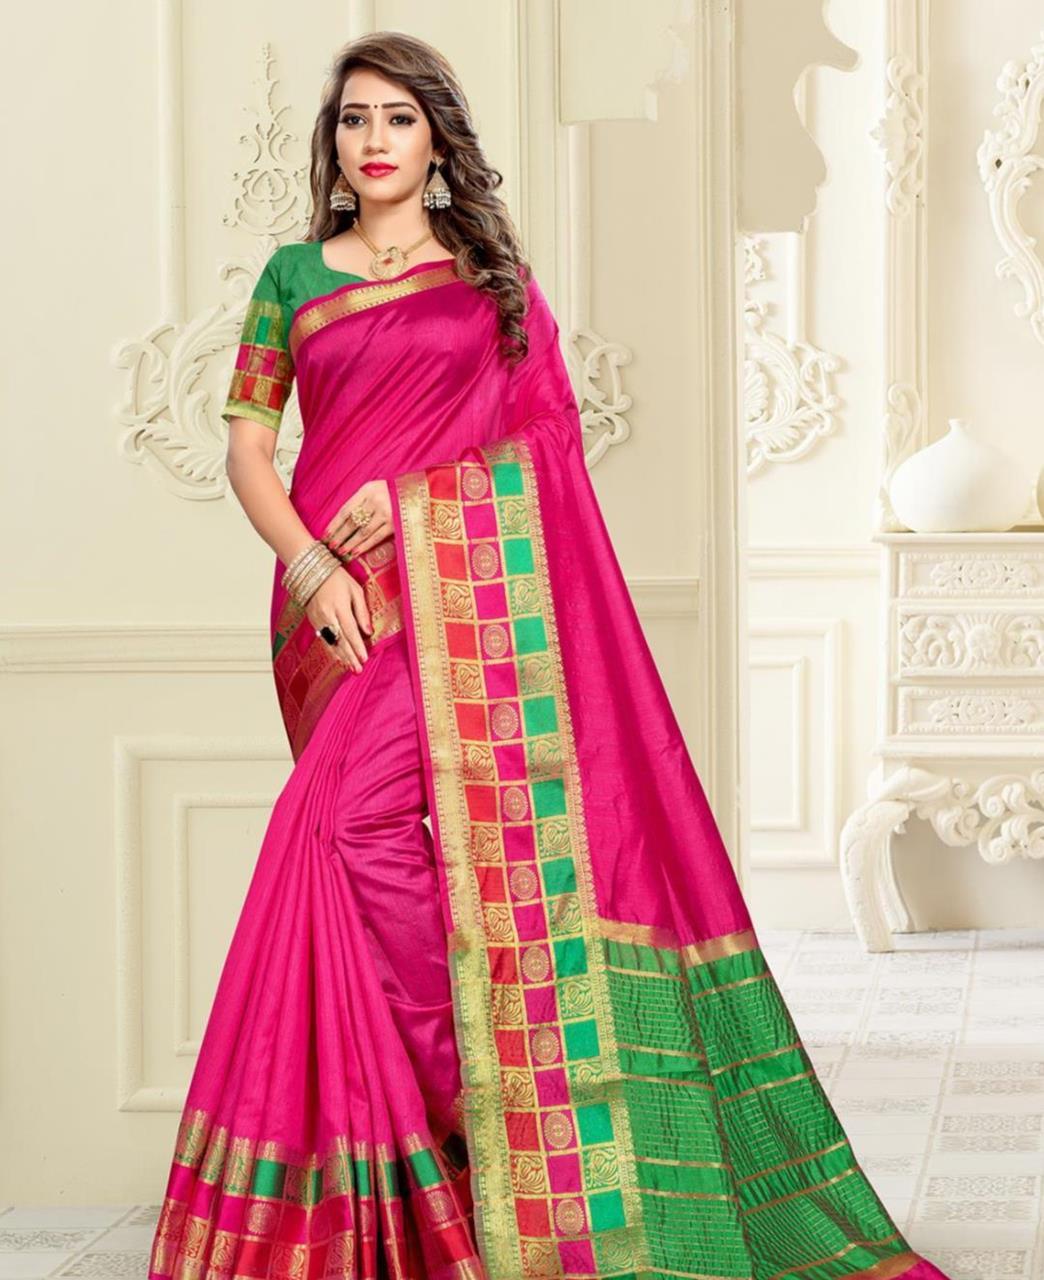 Cotton Saree in Rani Pink